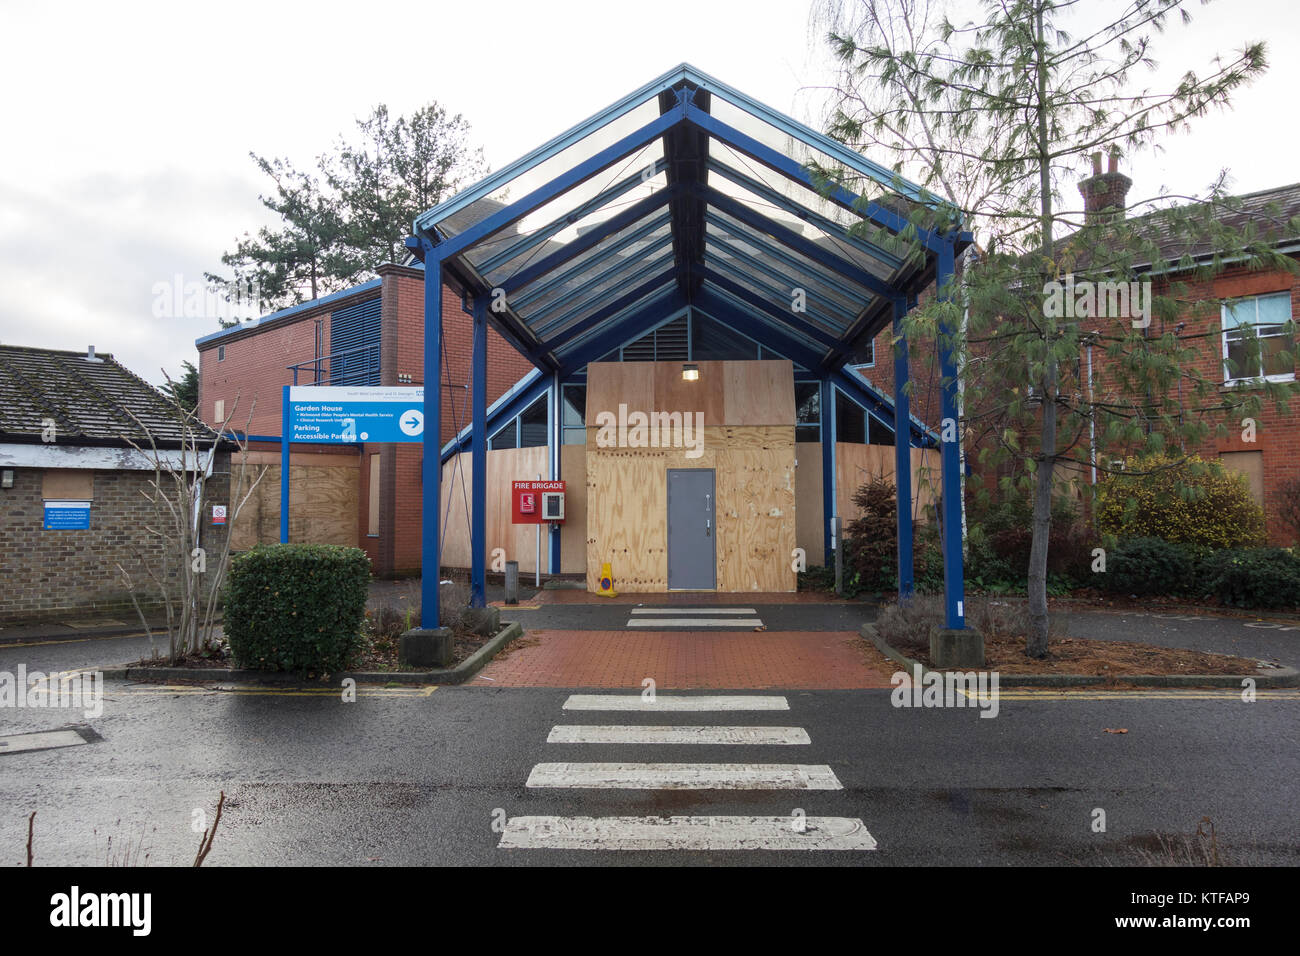 Barnes Hospital, South Worple Way, East Sheen, London Borough of Richmond upon Thames, UK Stock Photo